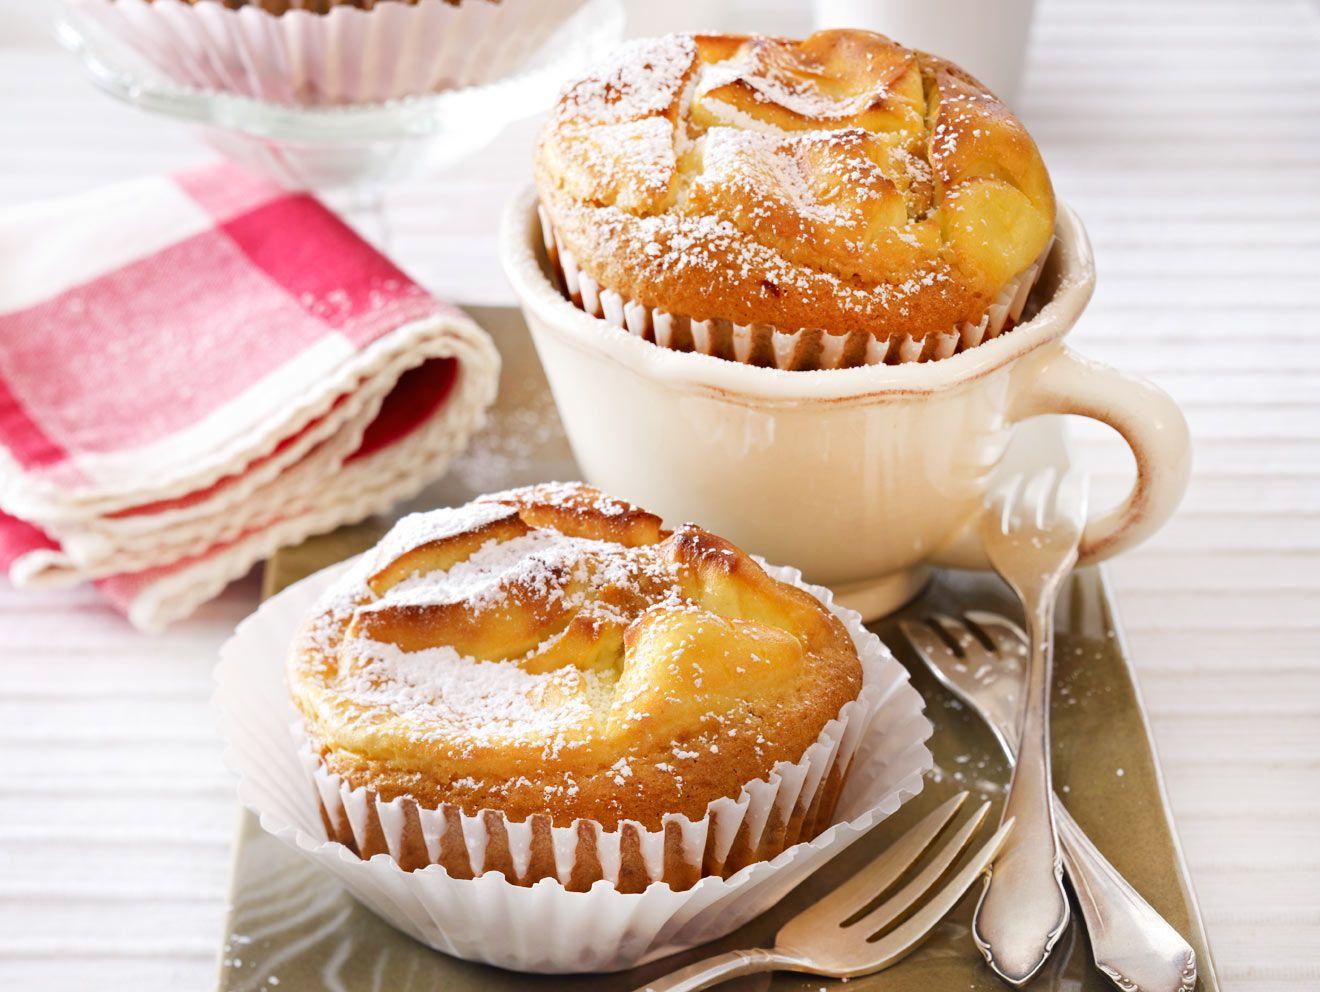 Kuhfleckenmuffins Rezept Kleiner kuchen, Kuchen